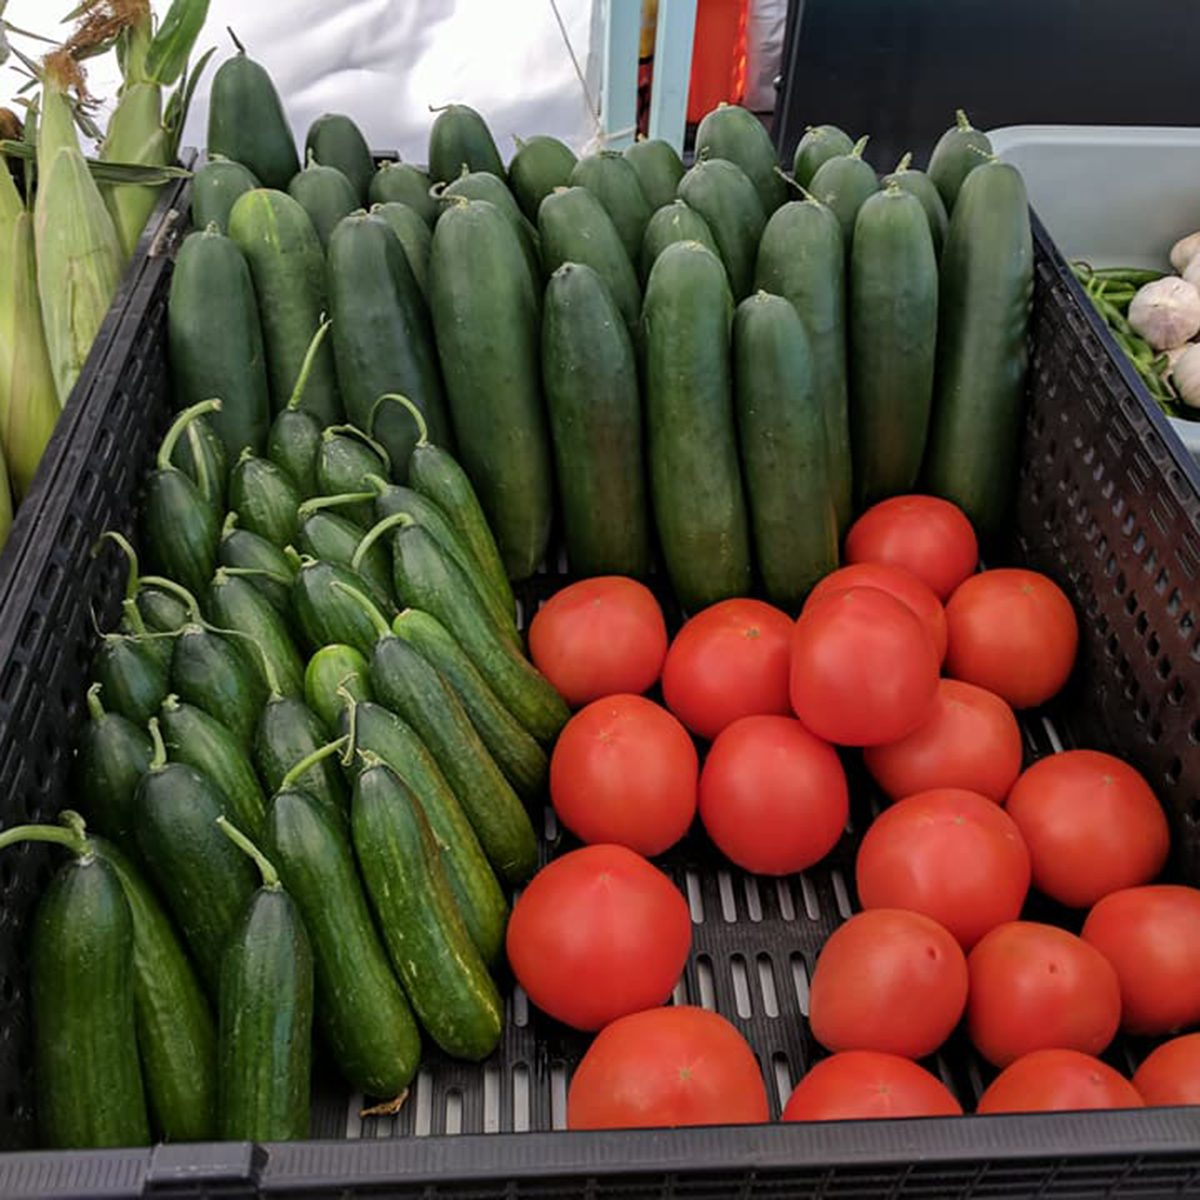 Arizona Carefree Farmers Market